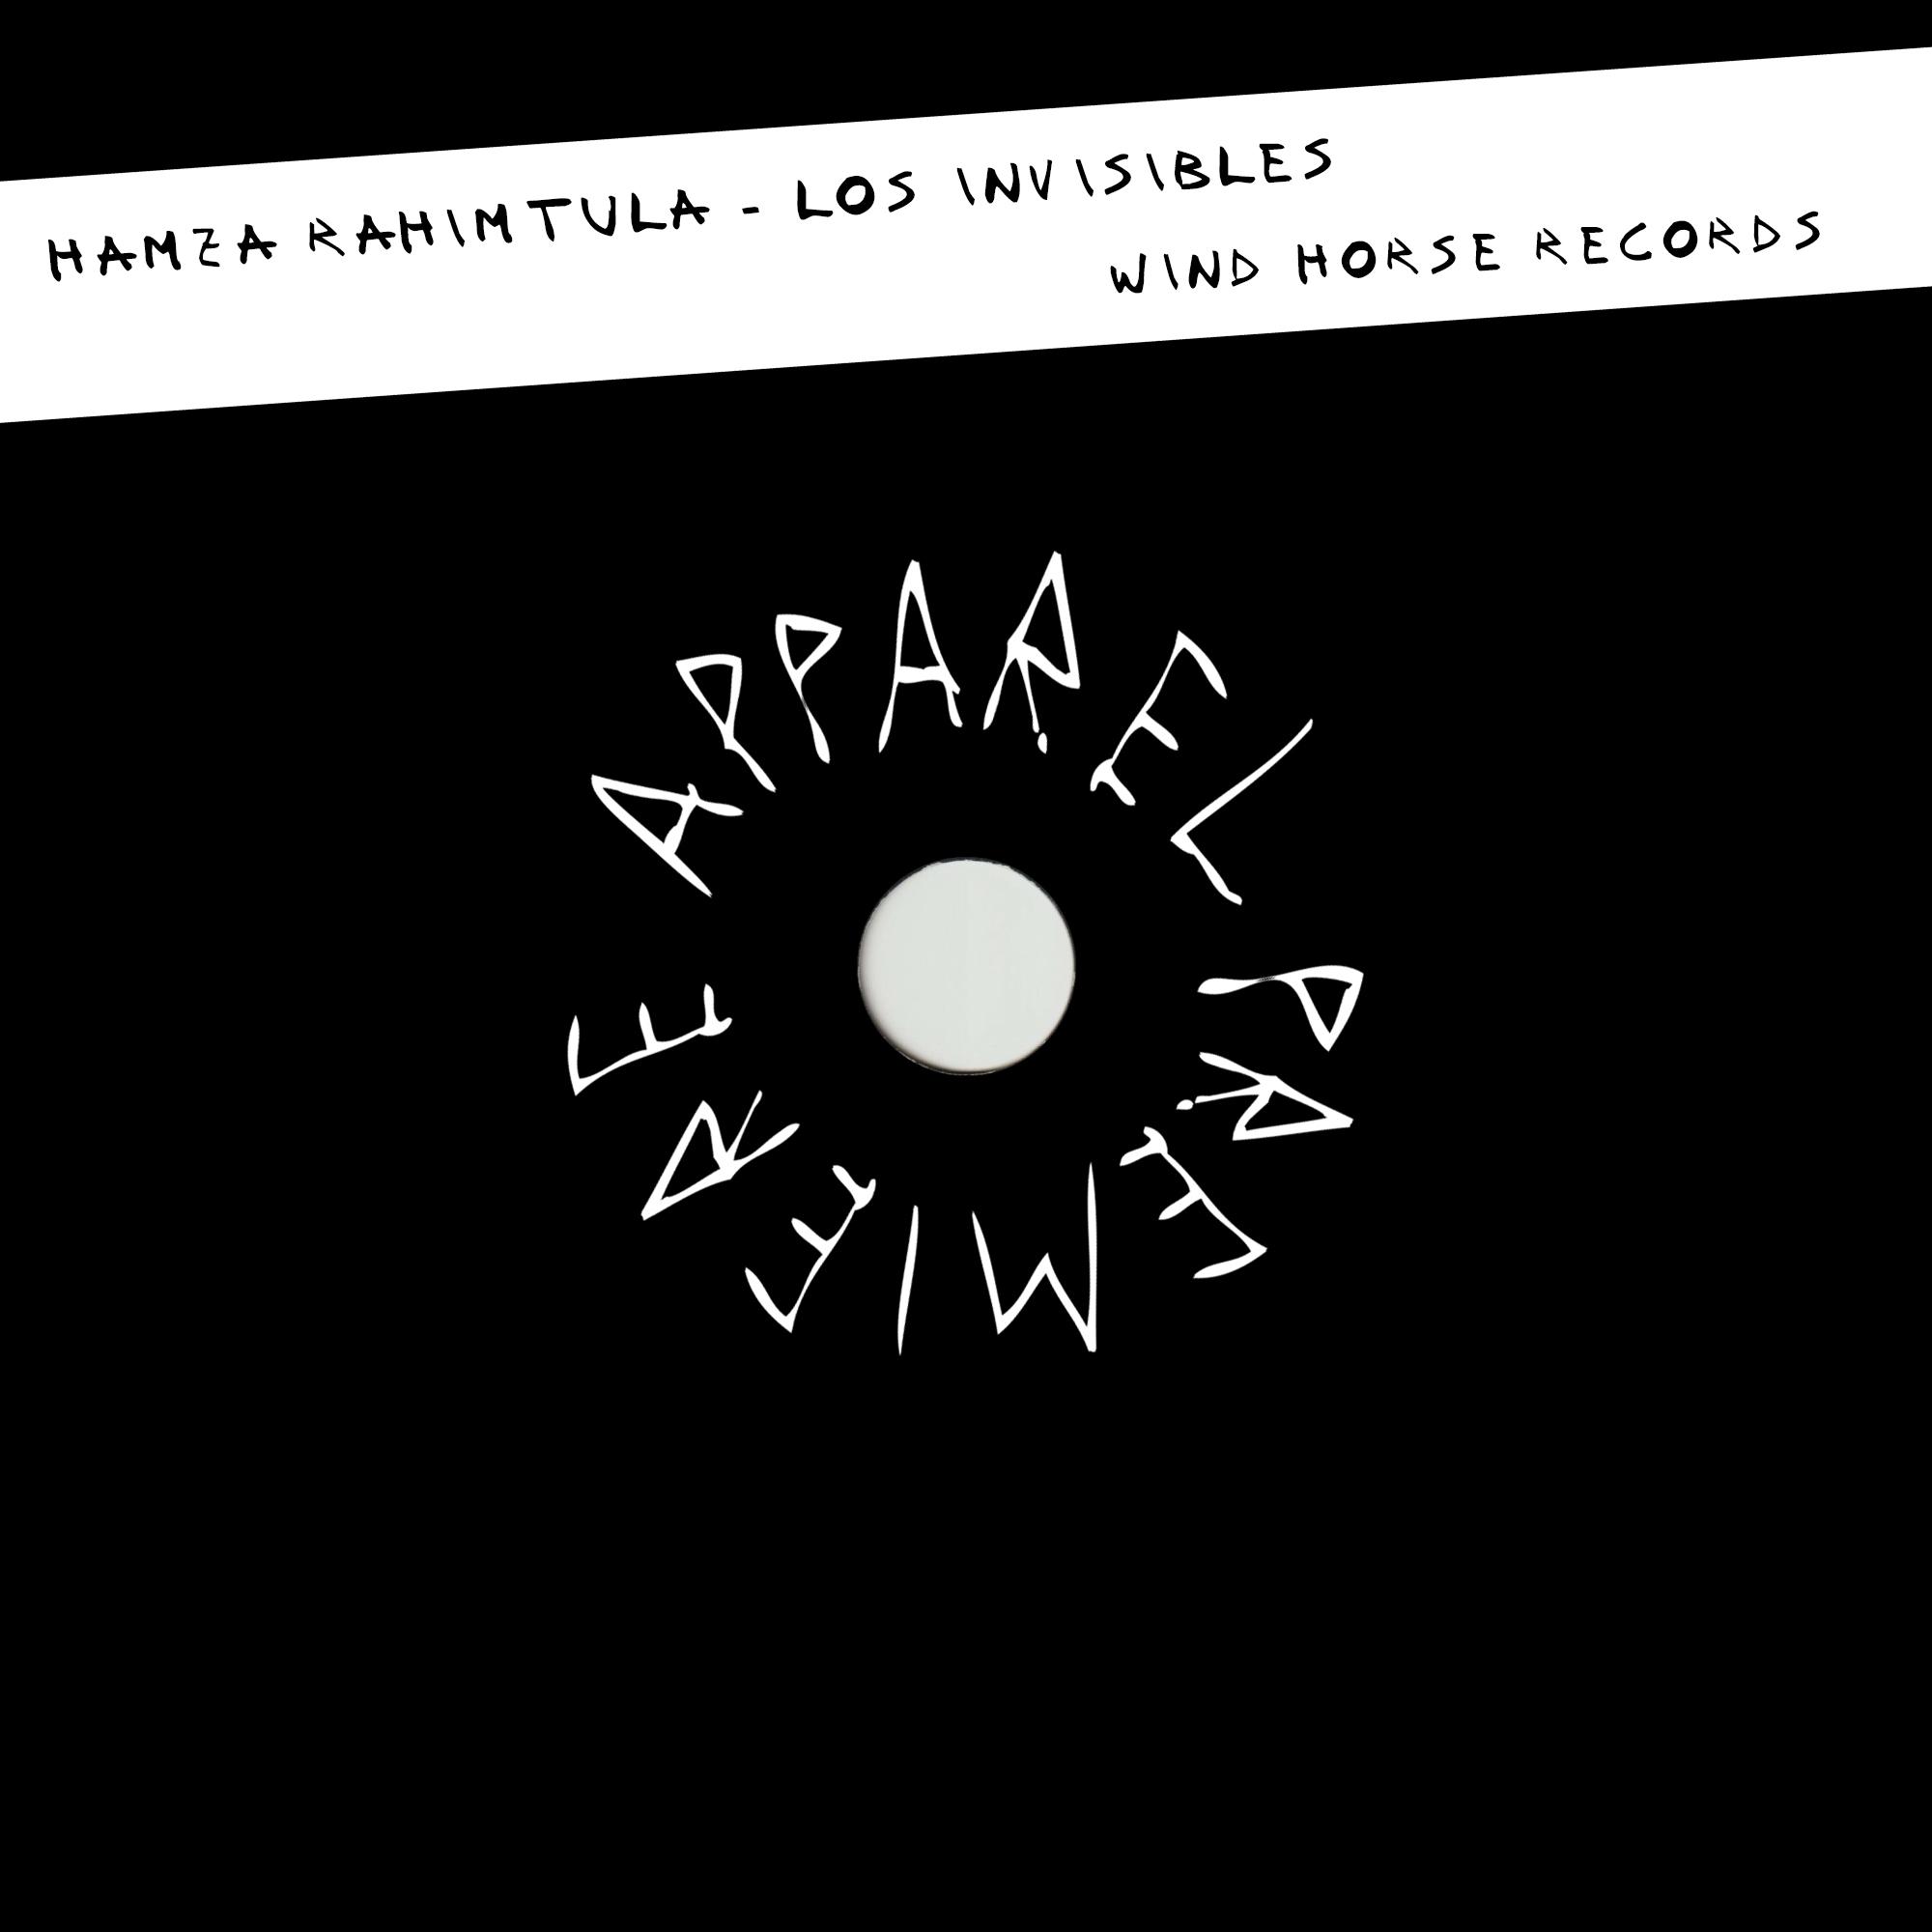 APPAREL PREMIERE Los Invisibles Wind Horse Records